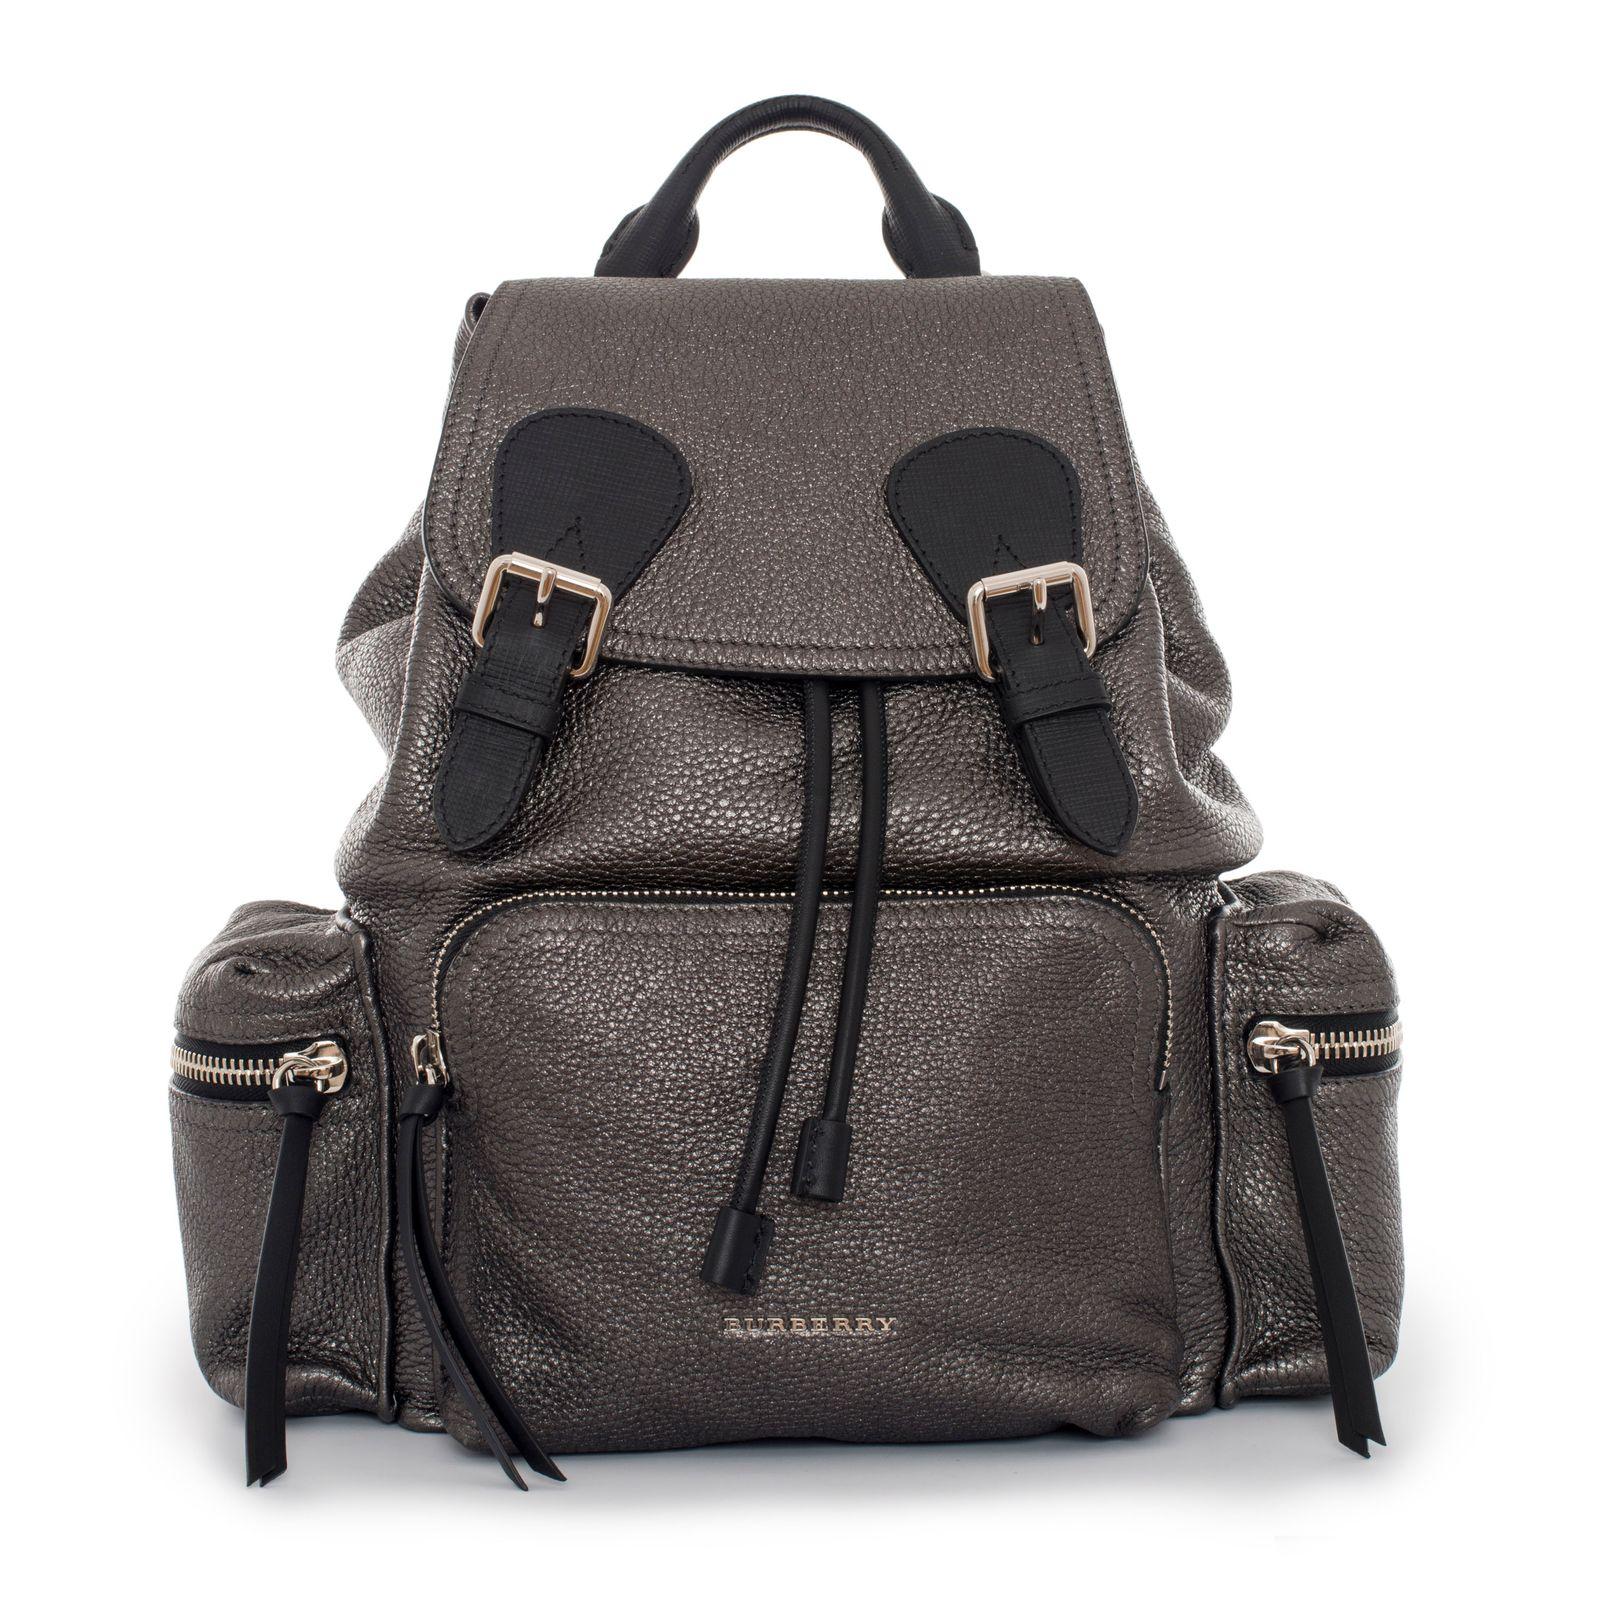 153ca54bd05ee Skórzany plecak BURBERRY – Kup Teraz! Najlepsze ceny i opinie! Sklep  Moliera2.com